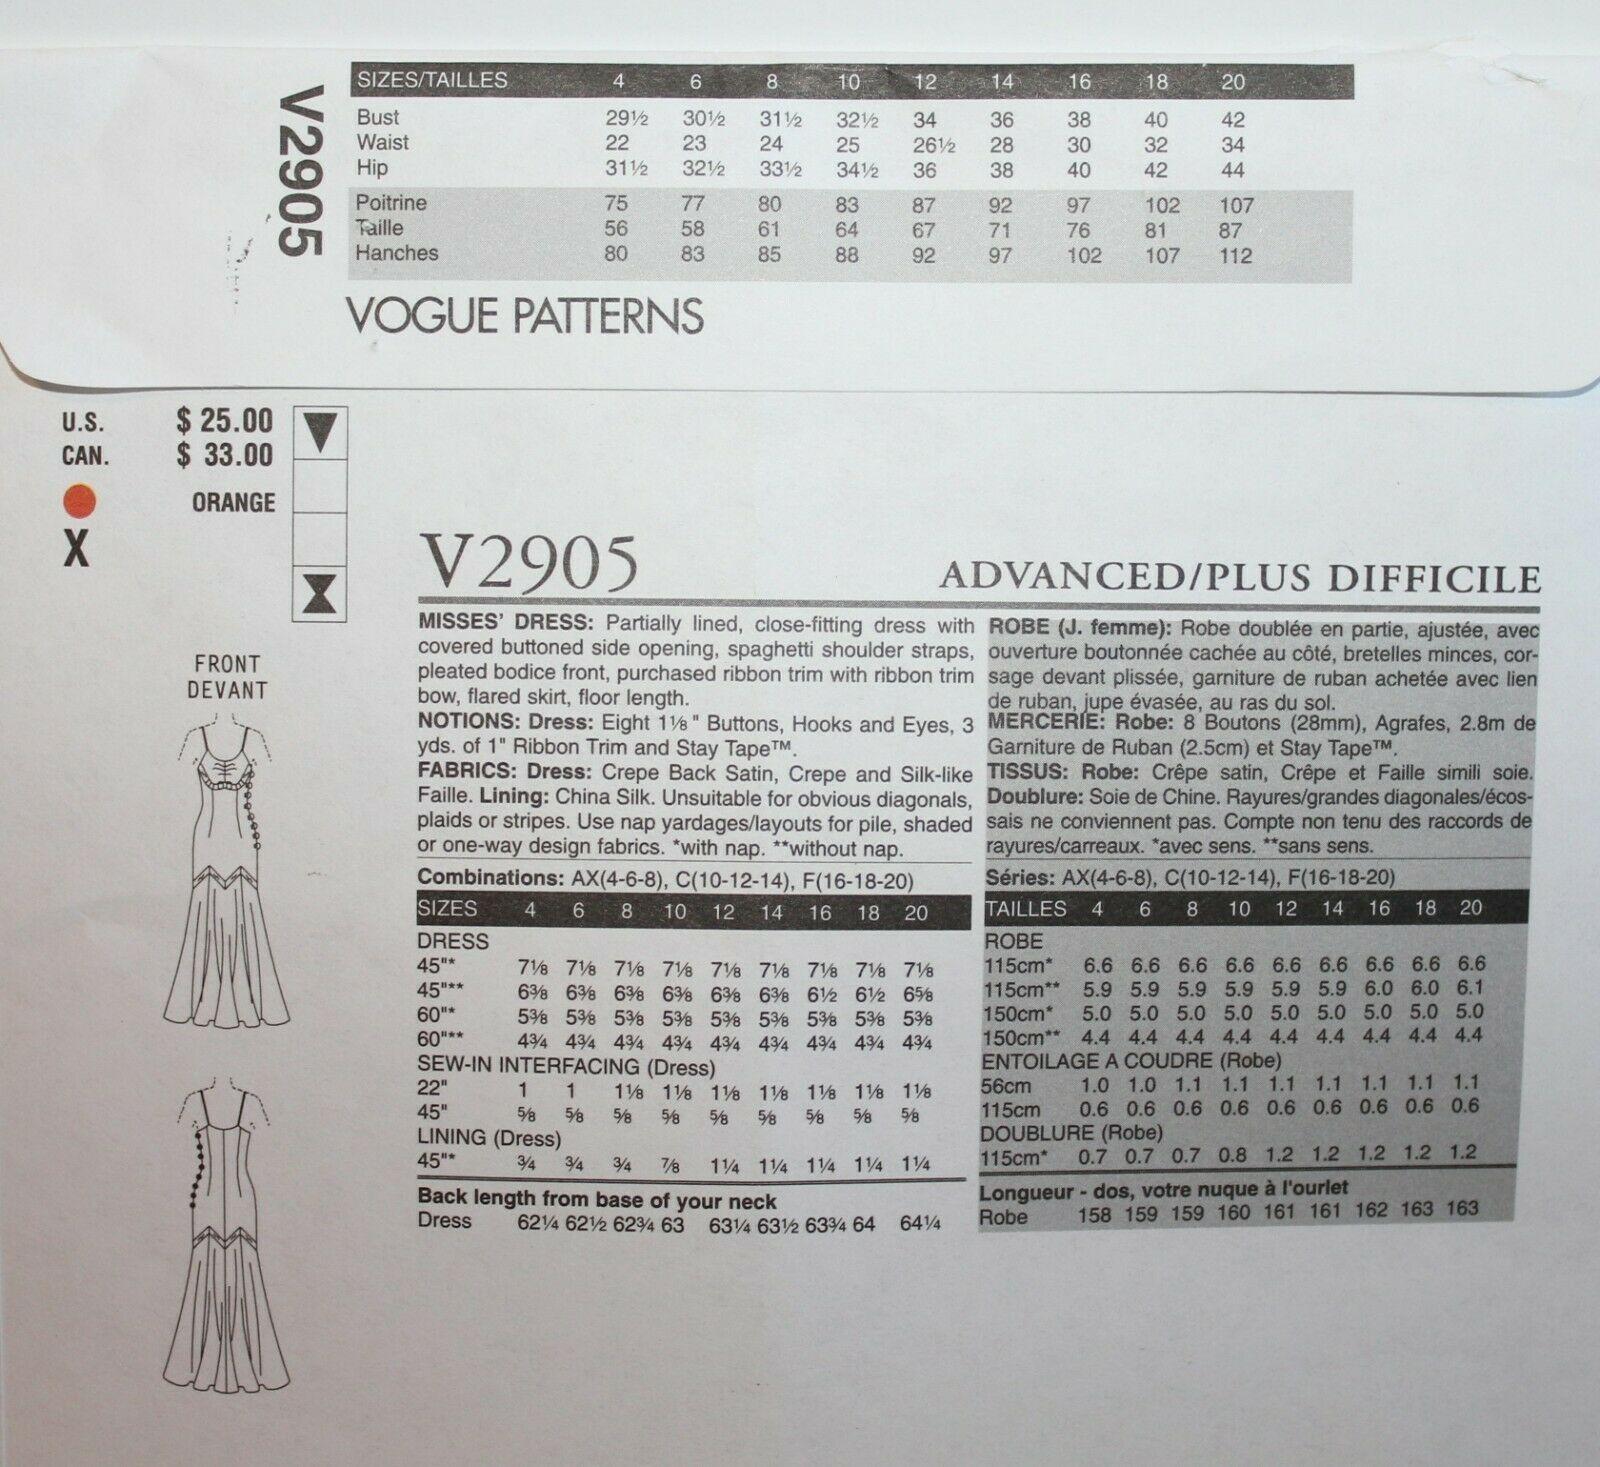 Vogue Sewing Pattern 2905 Badgley Mischka Formal Dress Size 10 12 14 image 2